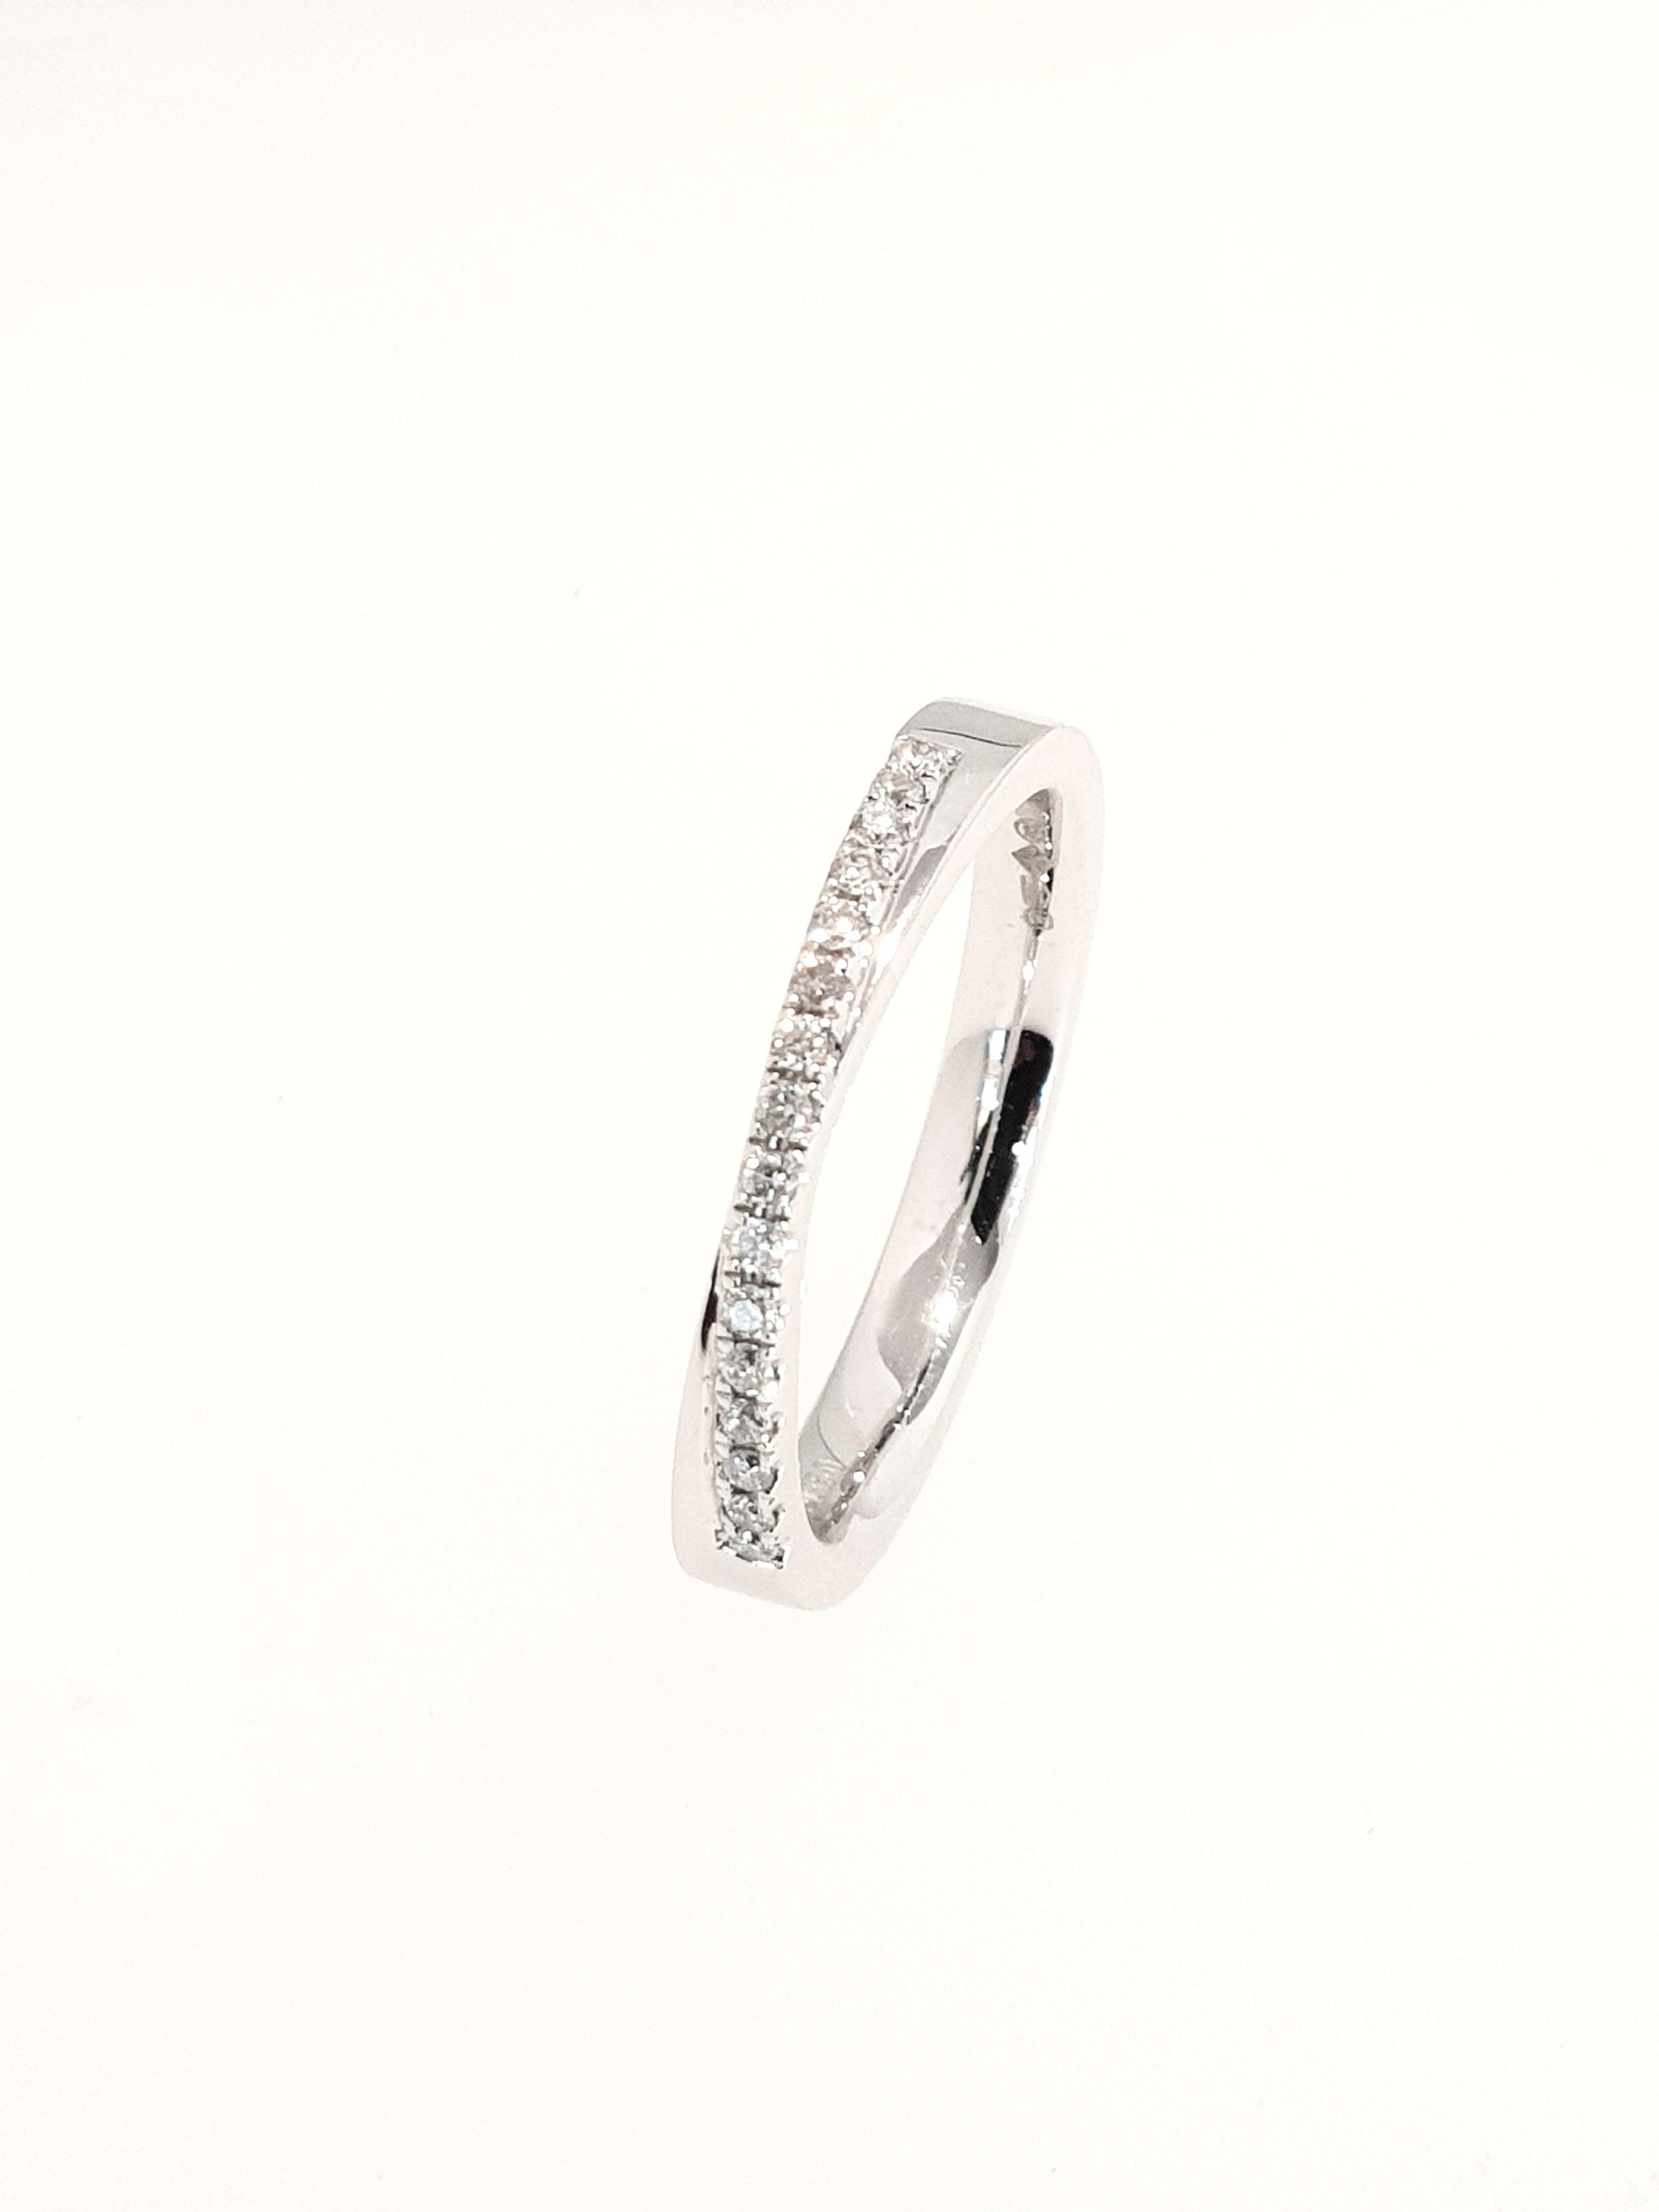 Platinum Eternity Ring  .16ct x 16  Stock Code: N8700  £1550